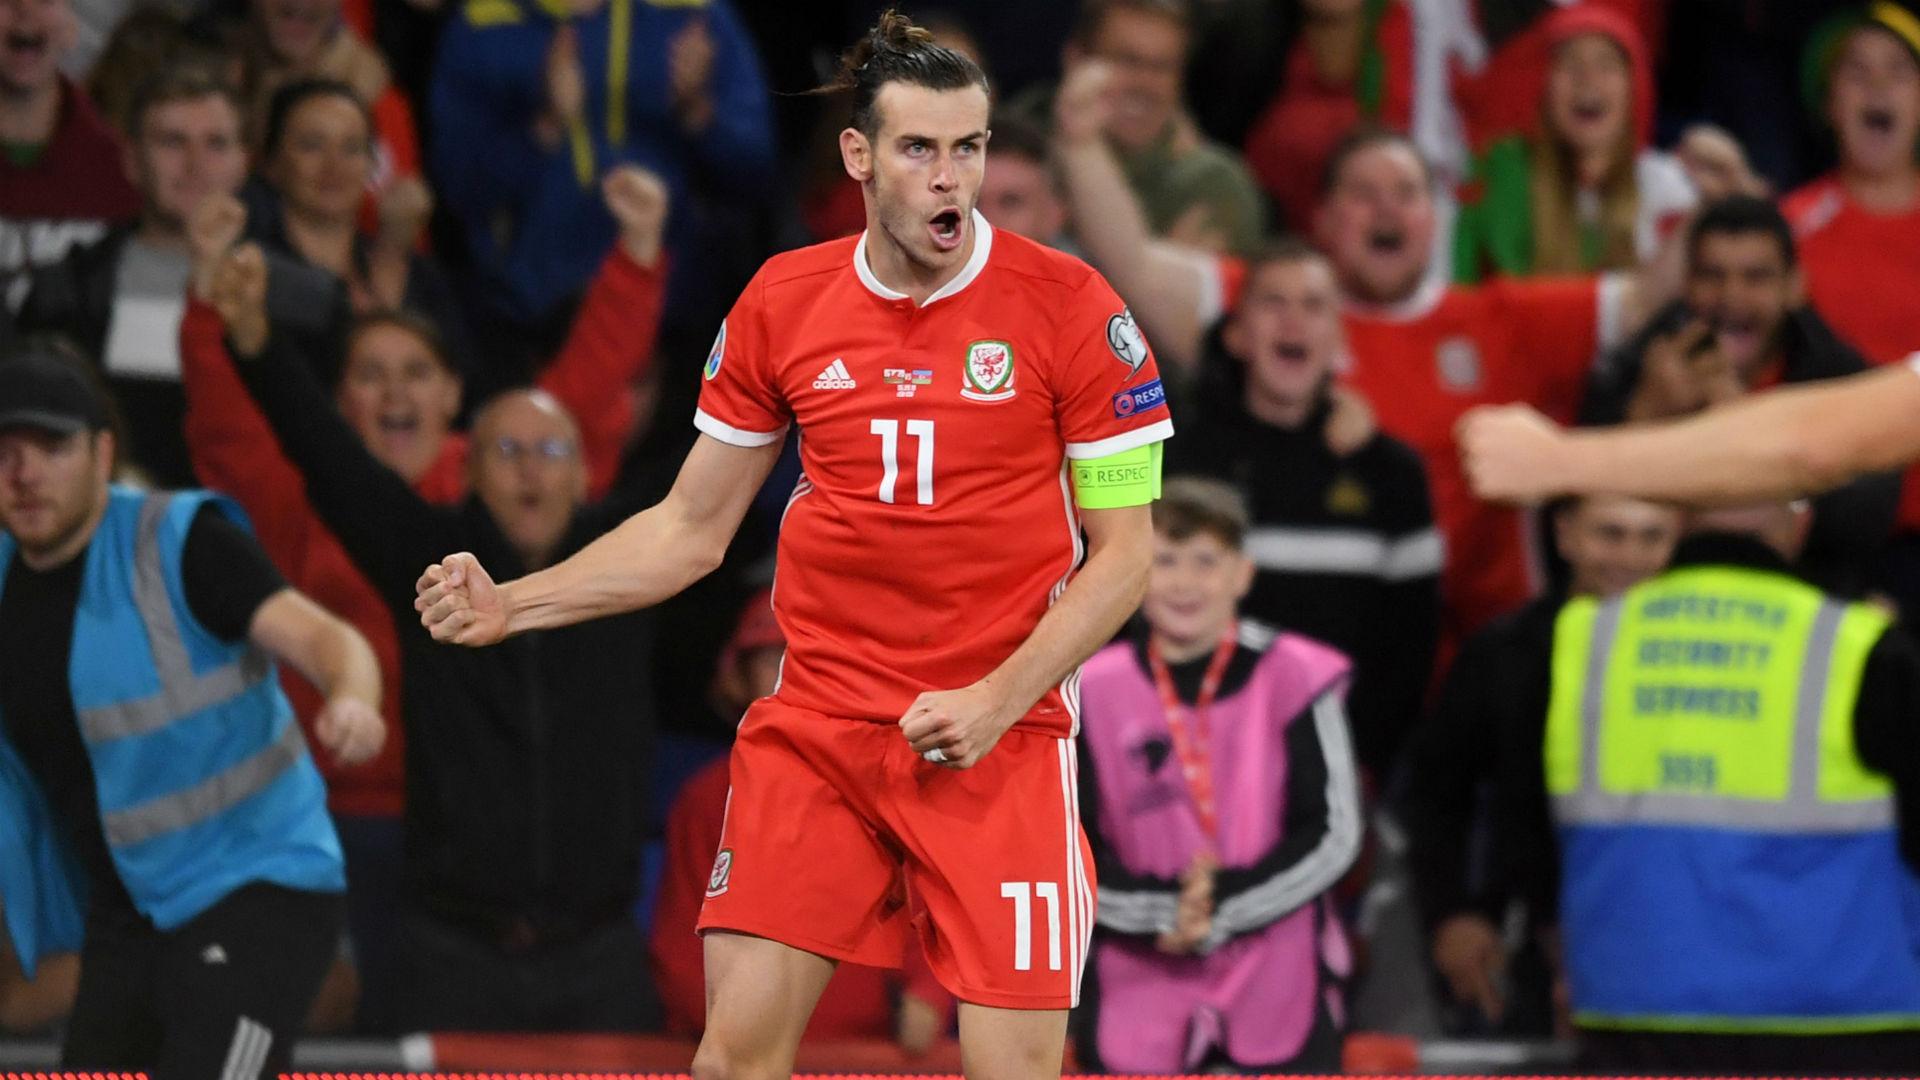 Wales 2-1 Azerbaijan: Bale rescues faltering hosts late on